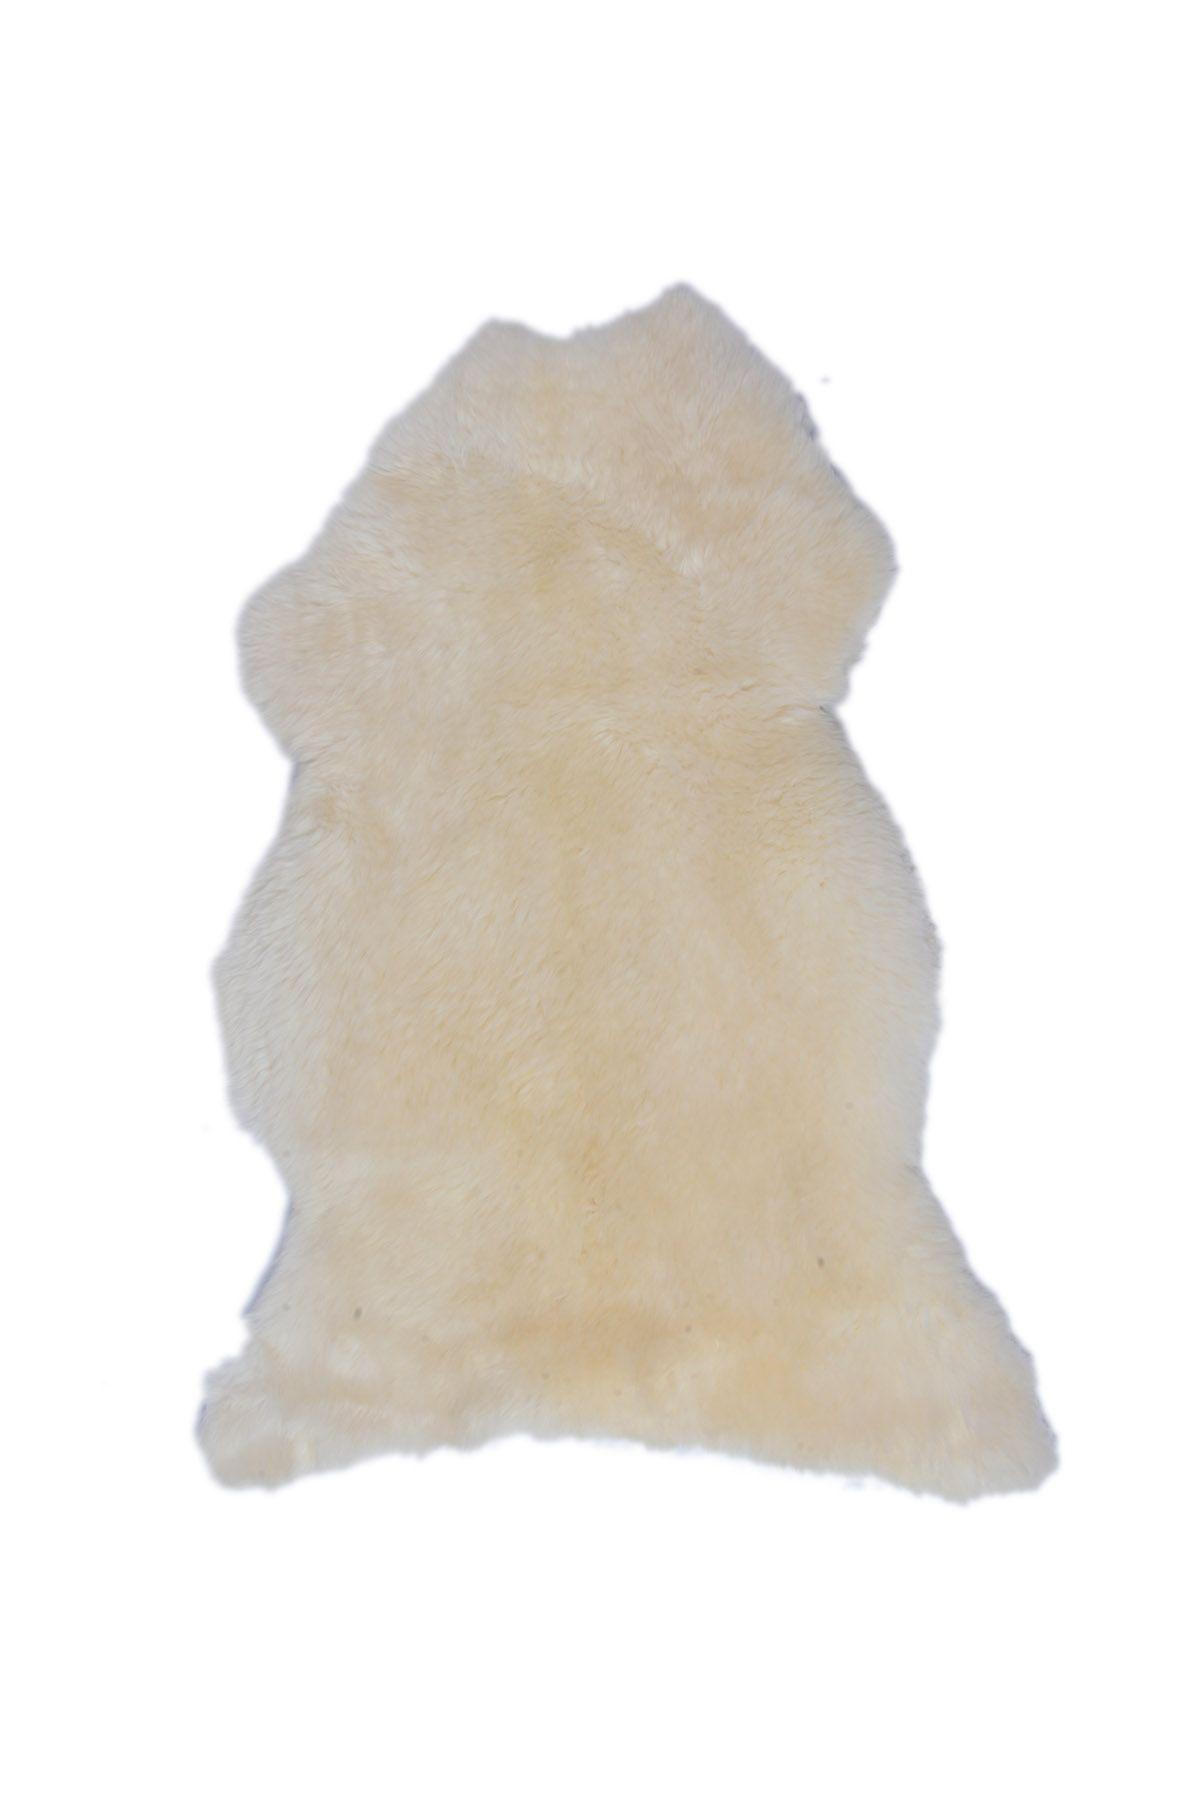 Erdogan Deri Decorative Sheepskin Rug White